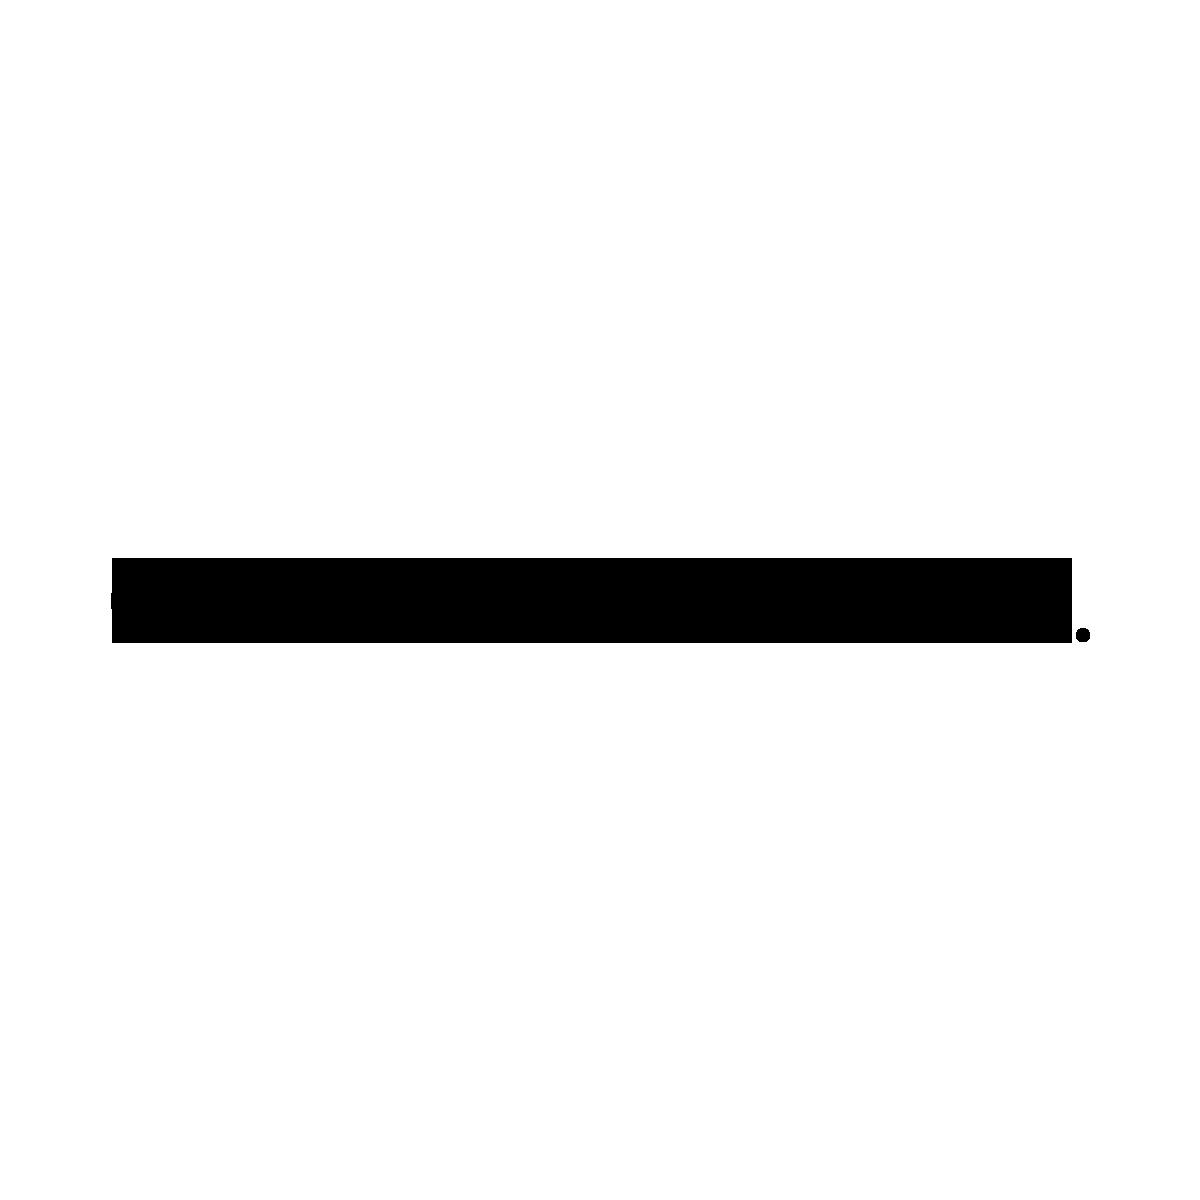 Heeled-espadrille-smooth-leather-black